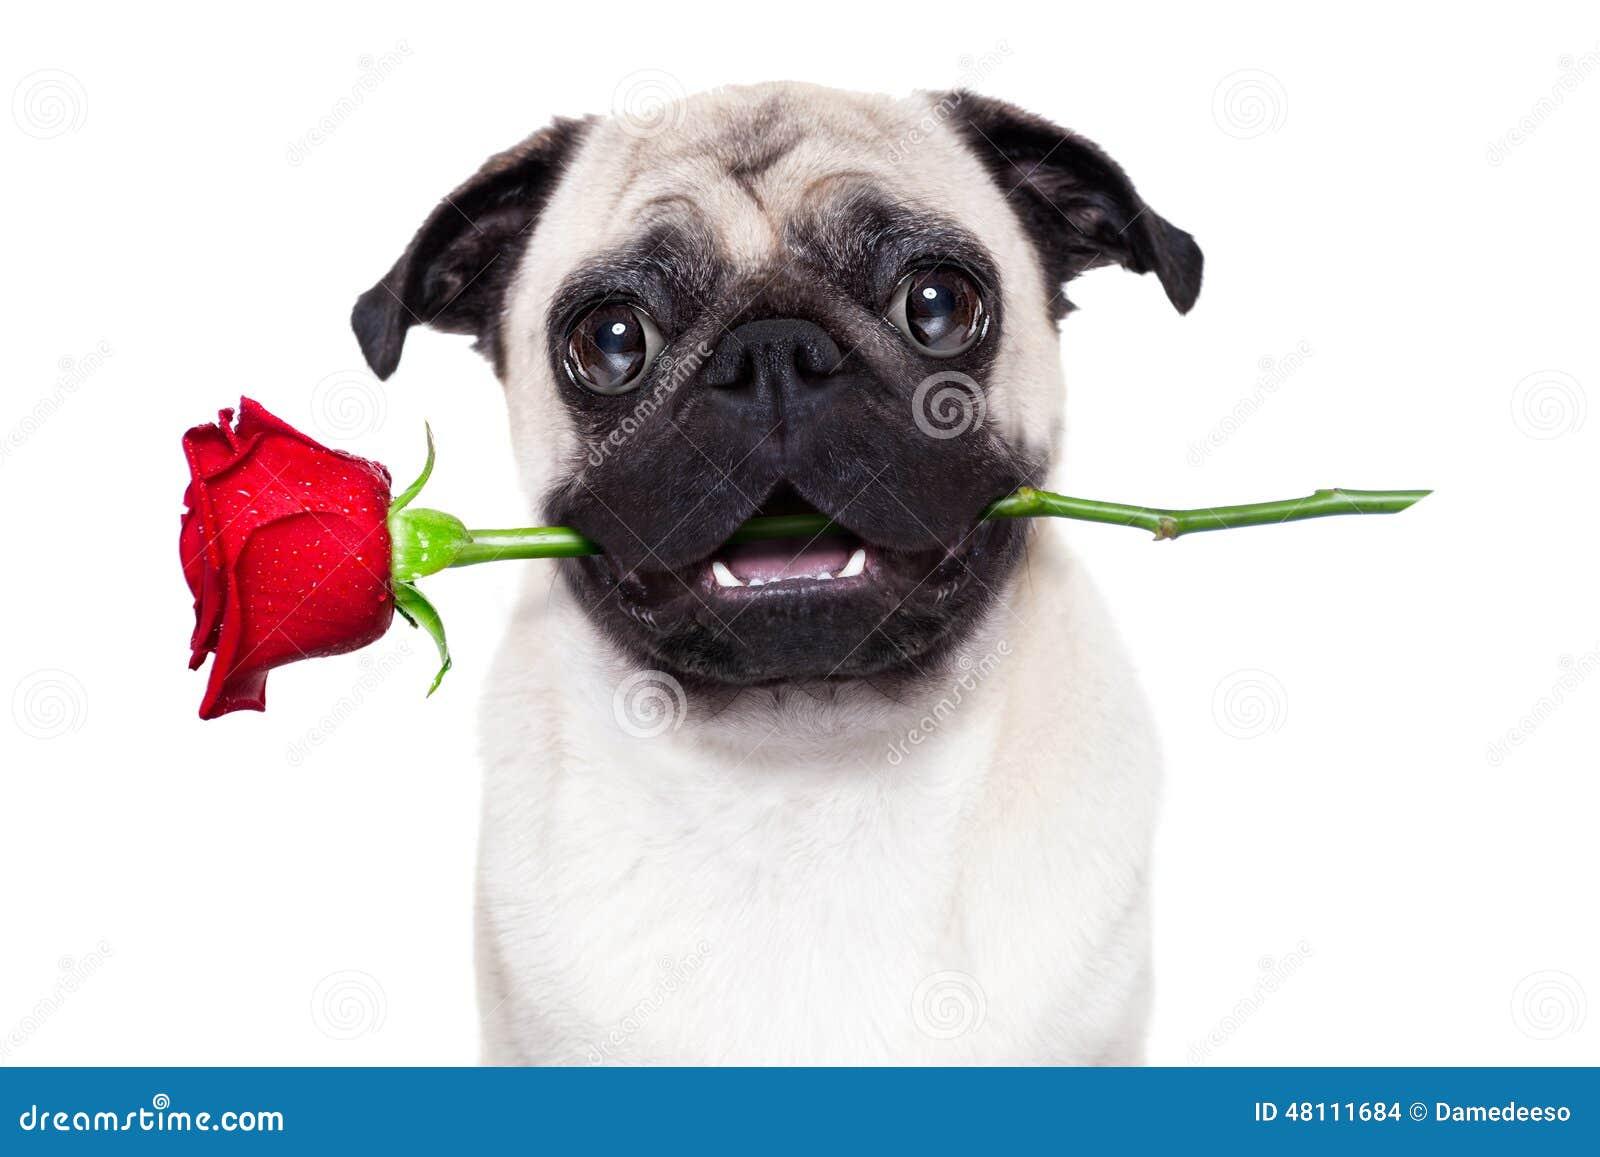 valentines dog stock photo  image of anniversary  happy